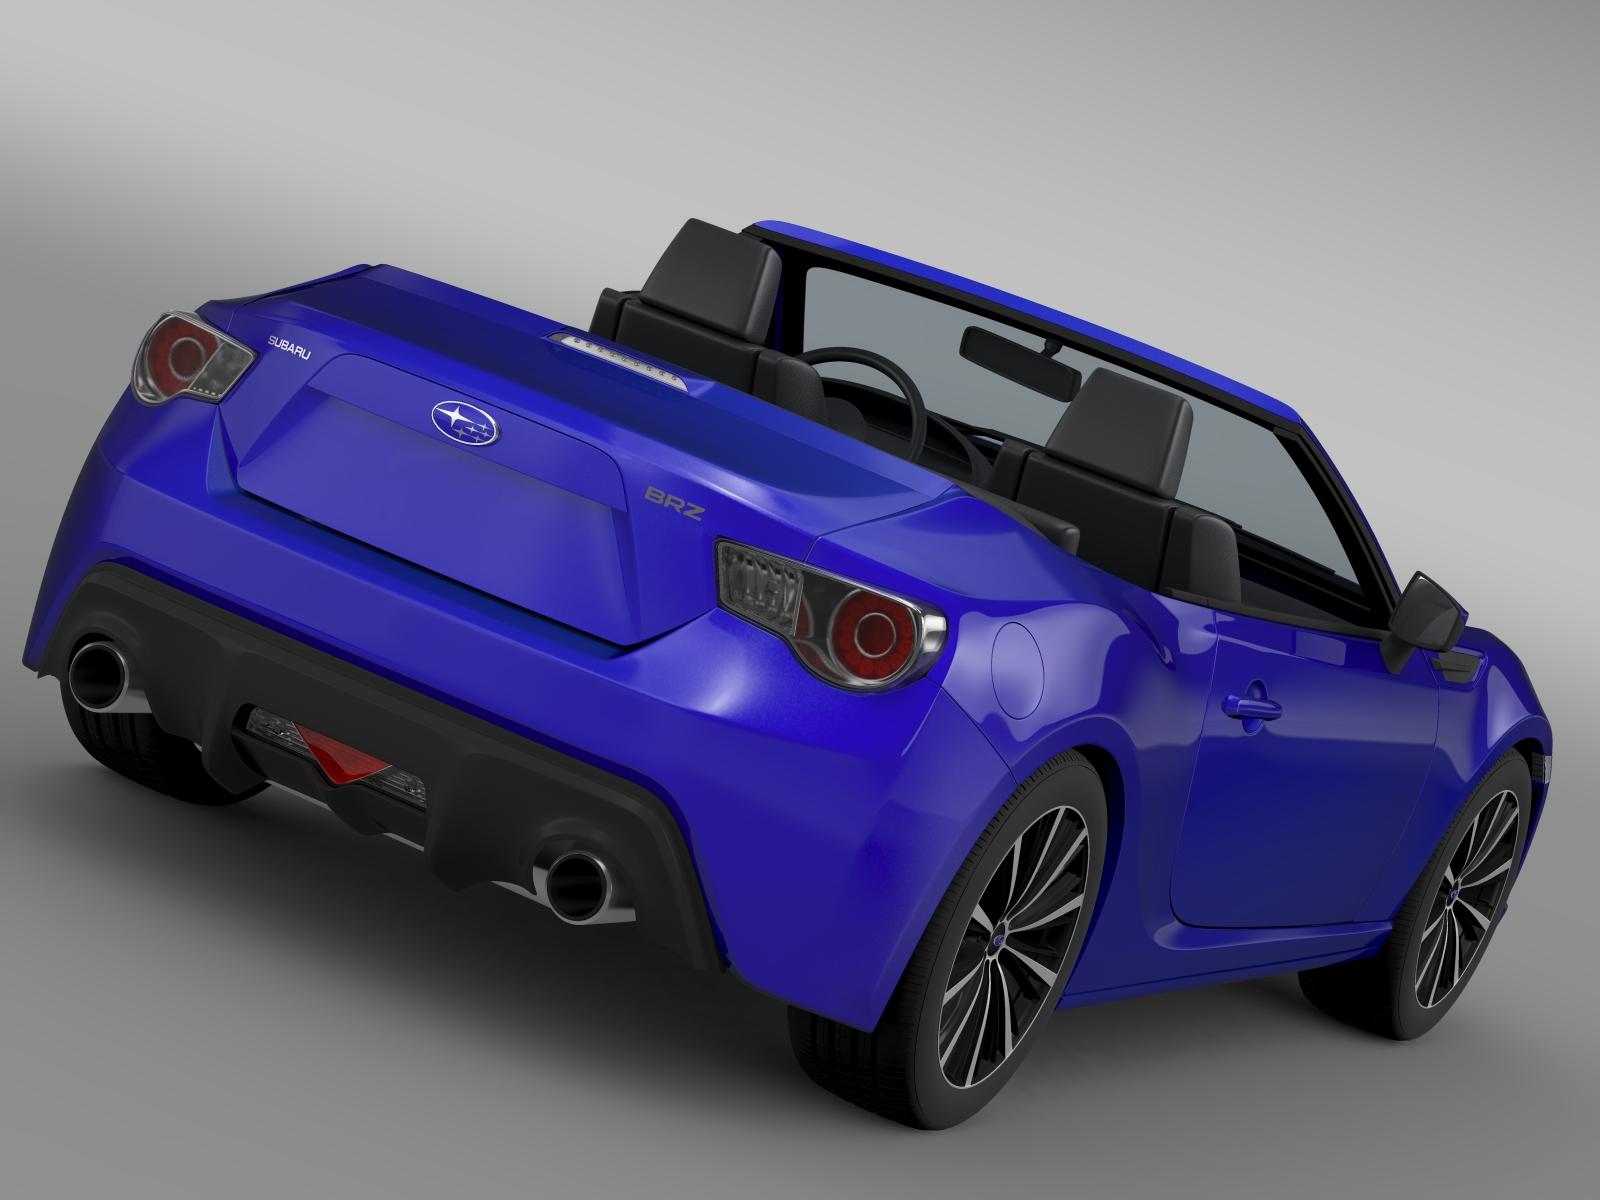 subaru brz zc6 cabrio 2015 3d model buy subaru brz zc6 cabrio 2015 3d model flatpyramid. Black Bedroom Furniture Sets. Home Design Ideas